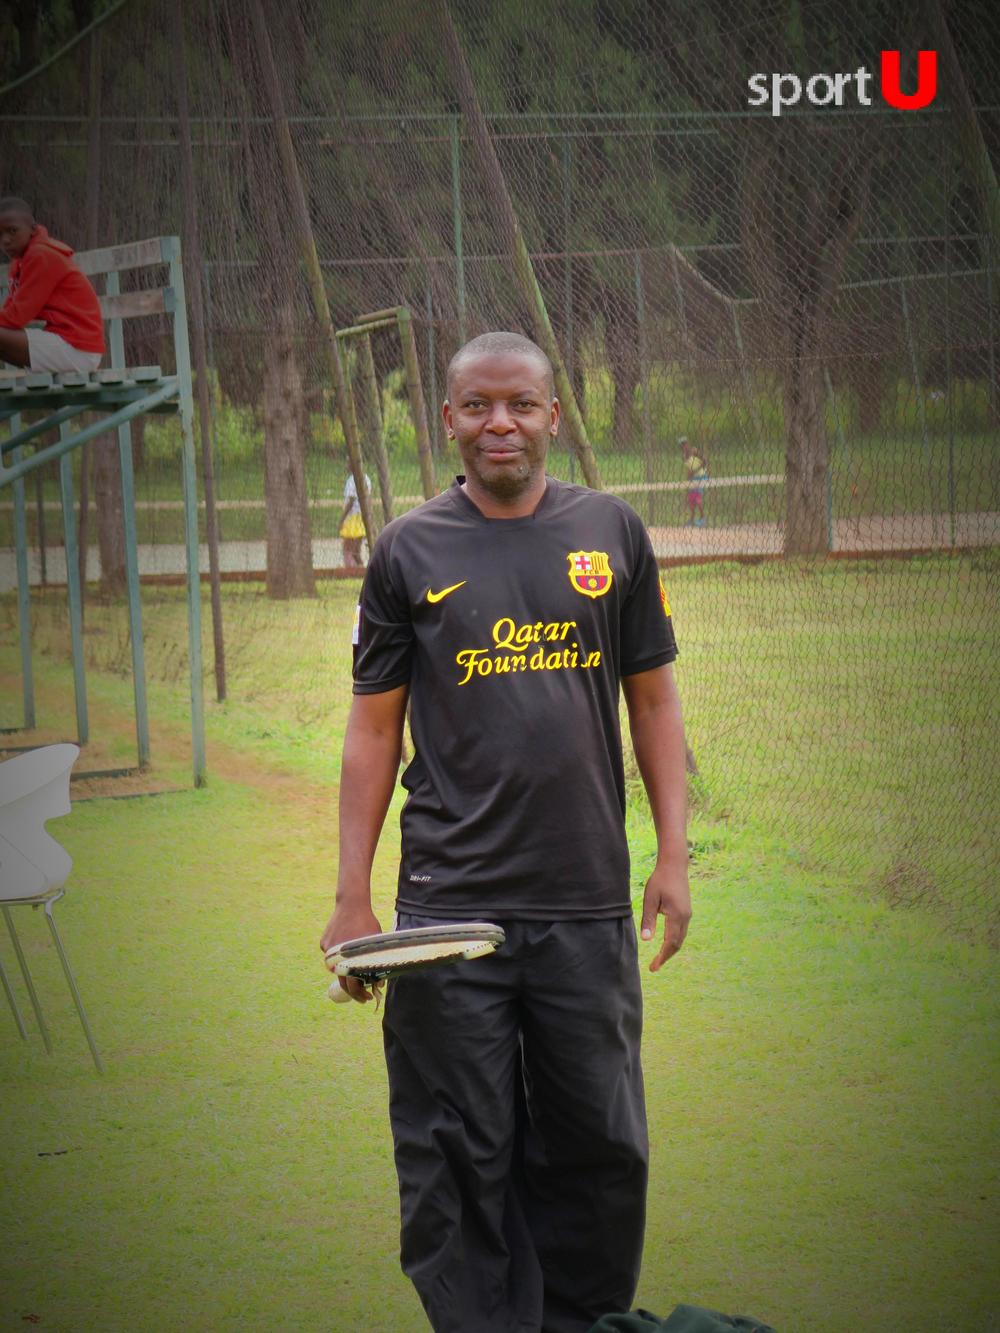 AfricanAces84. sportU.jpg